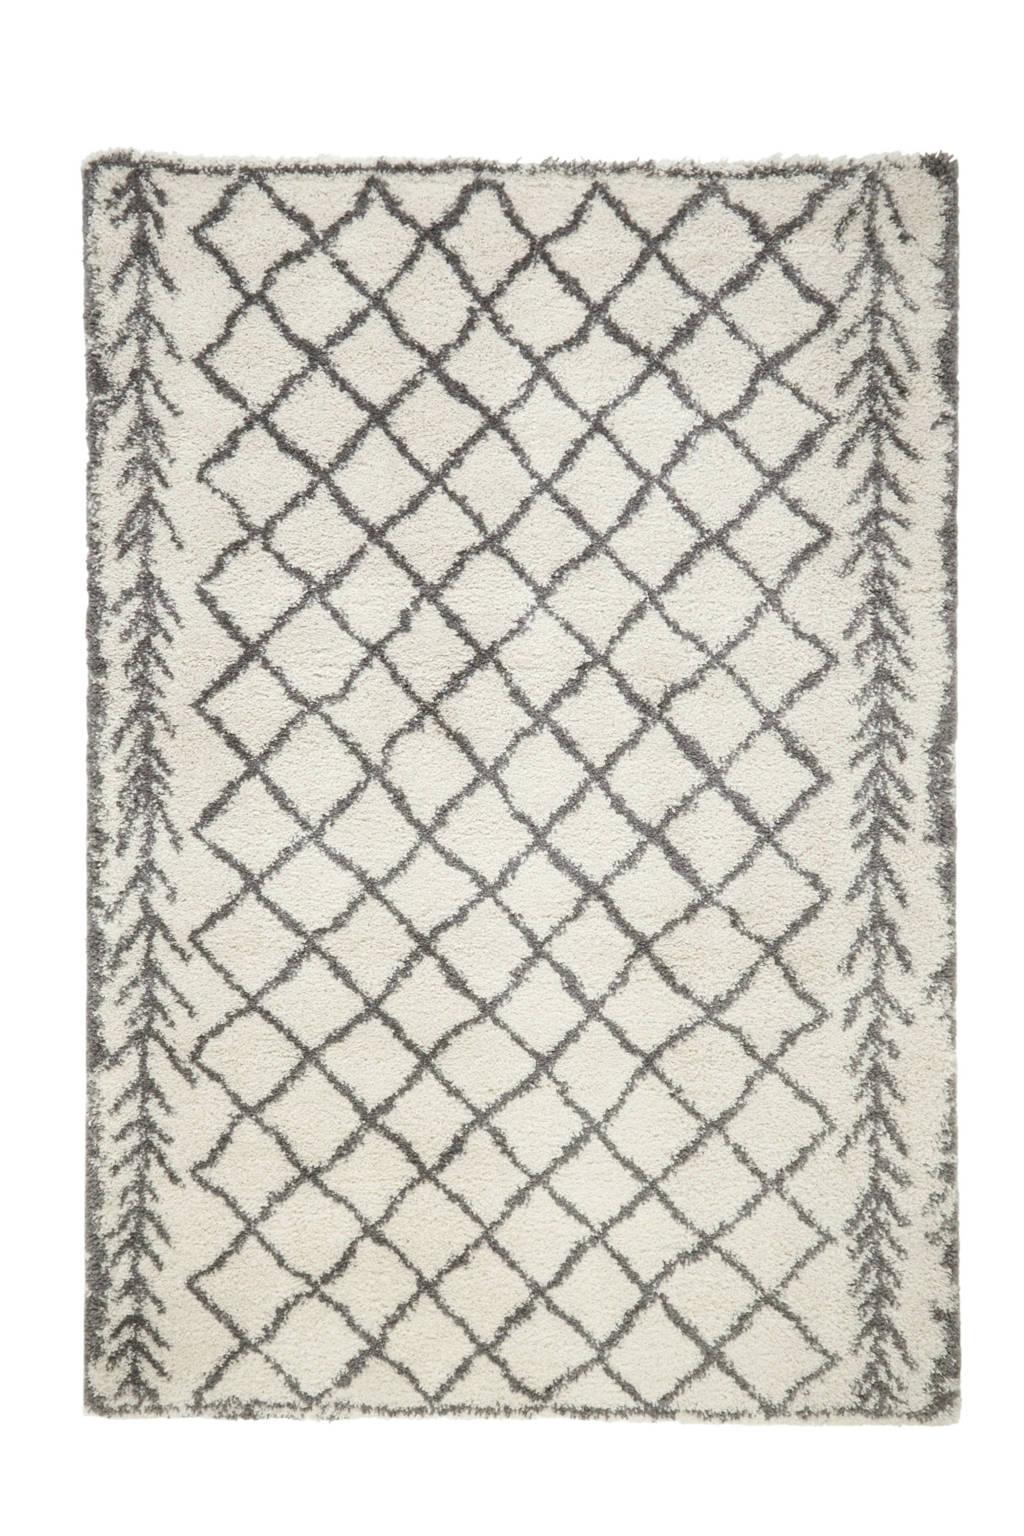 whkmp's own Vloerkleed  (230x160 cm), Wit/zwart